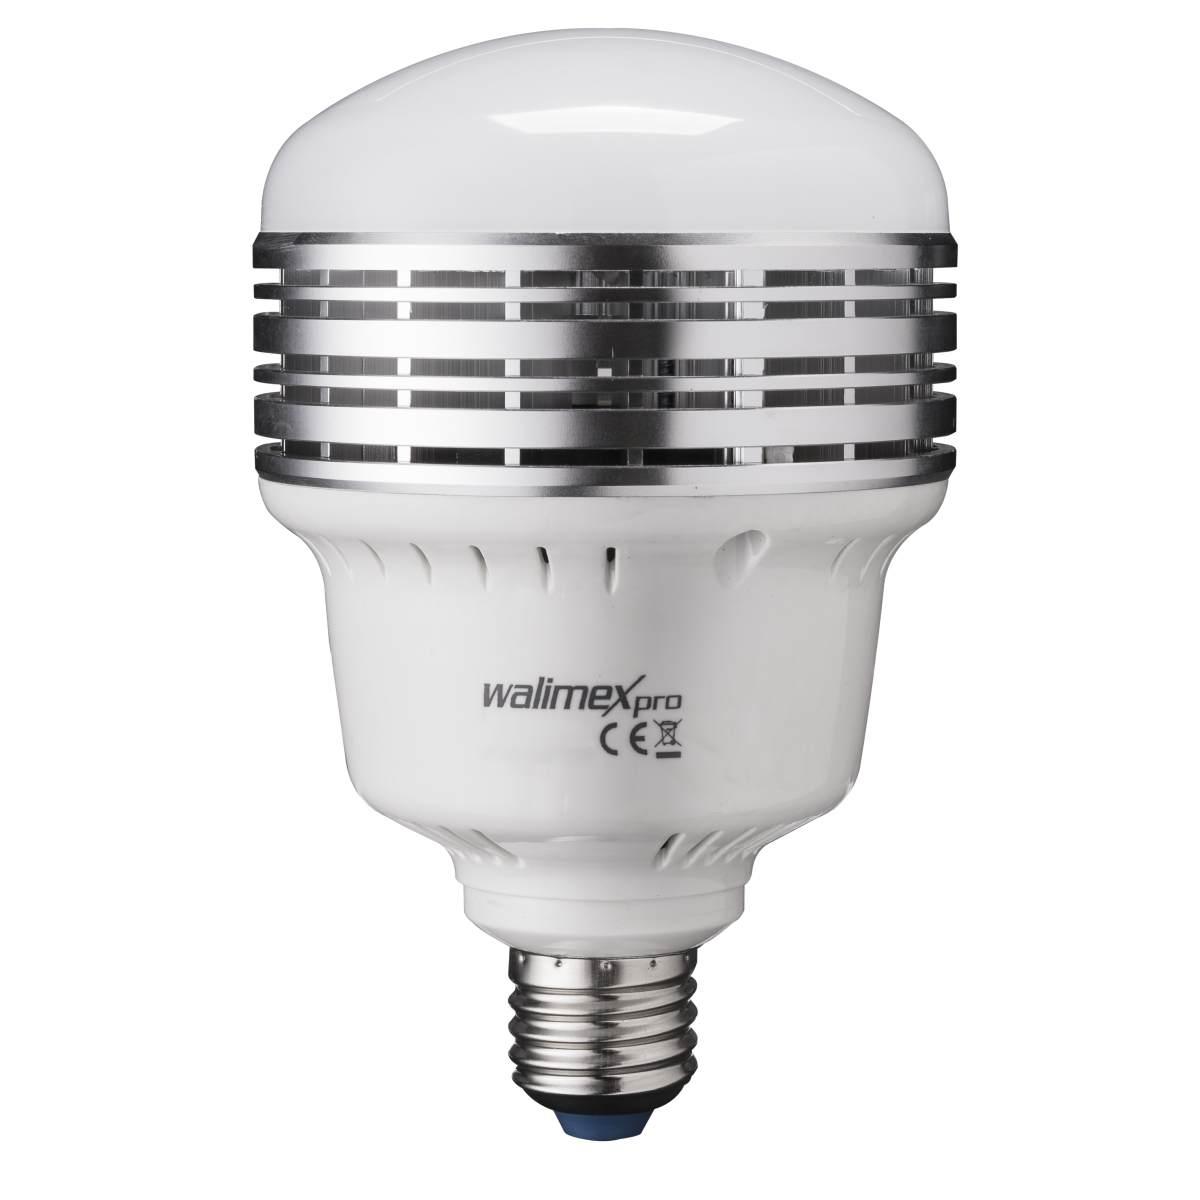 Walimex pro spiral lamp VL - 35 L LED